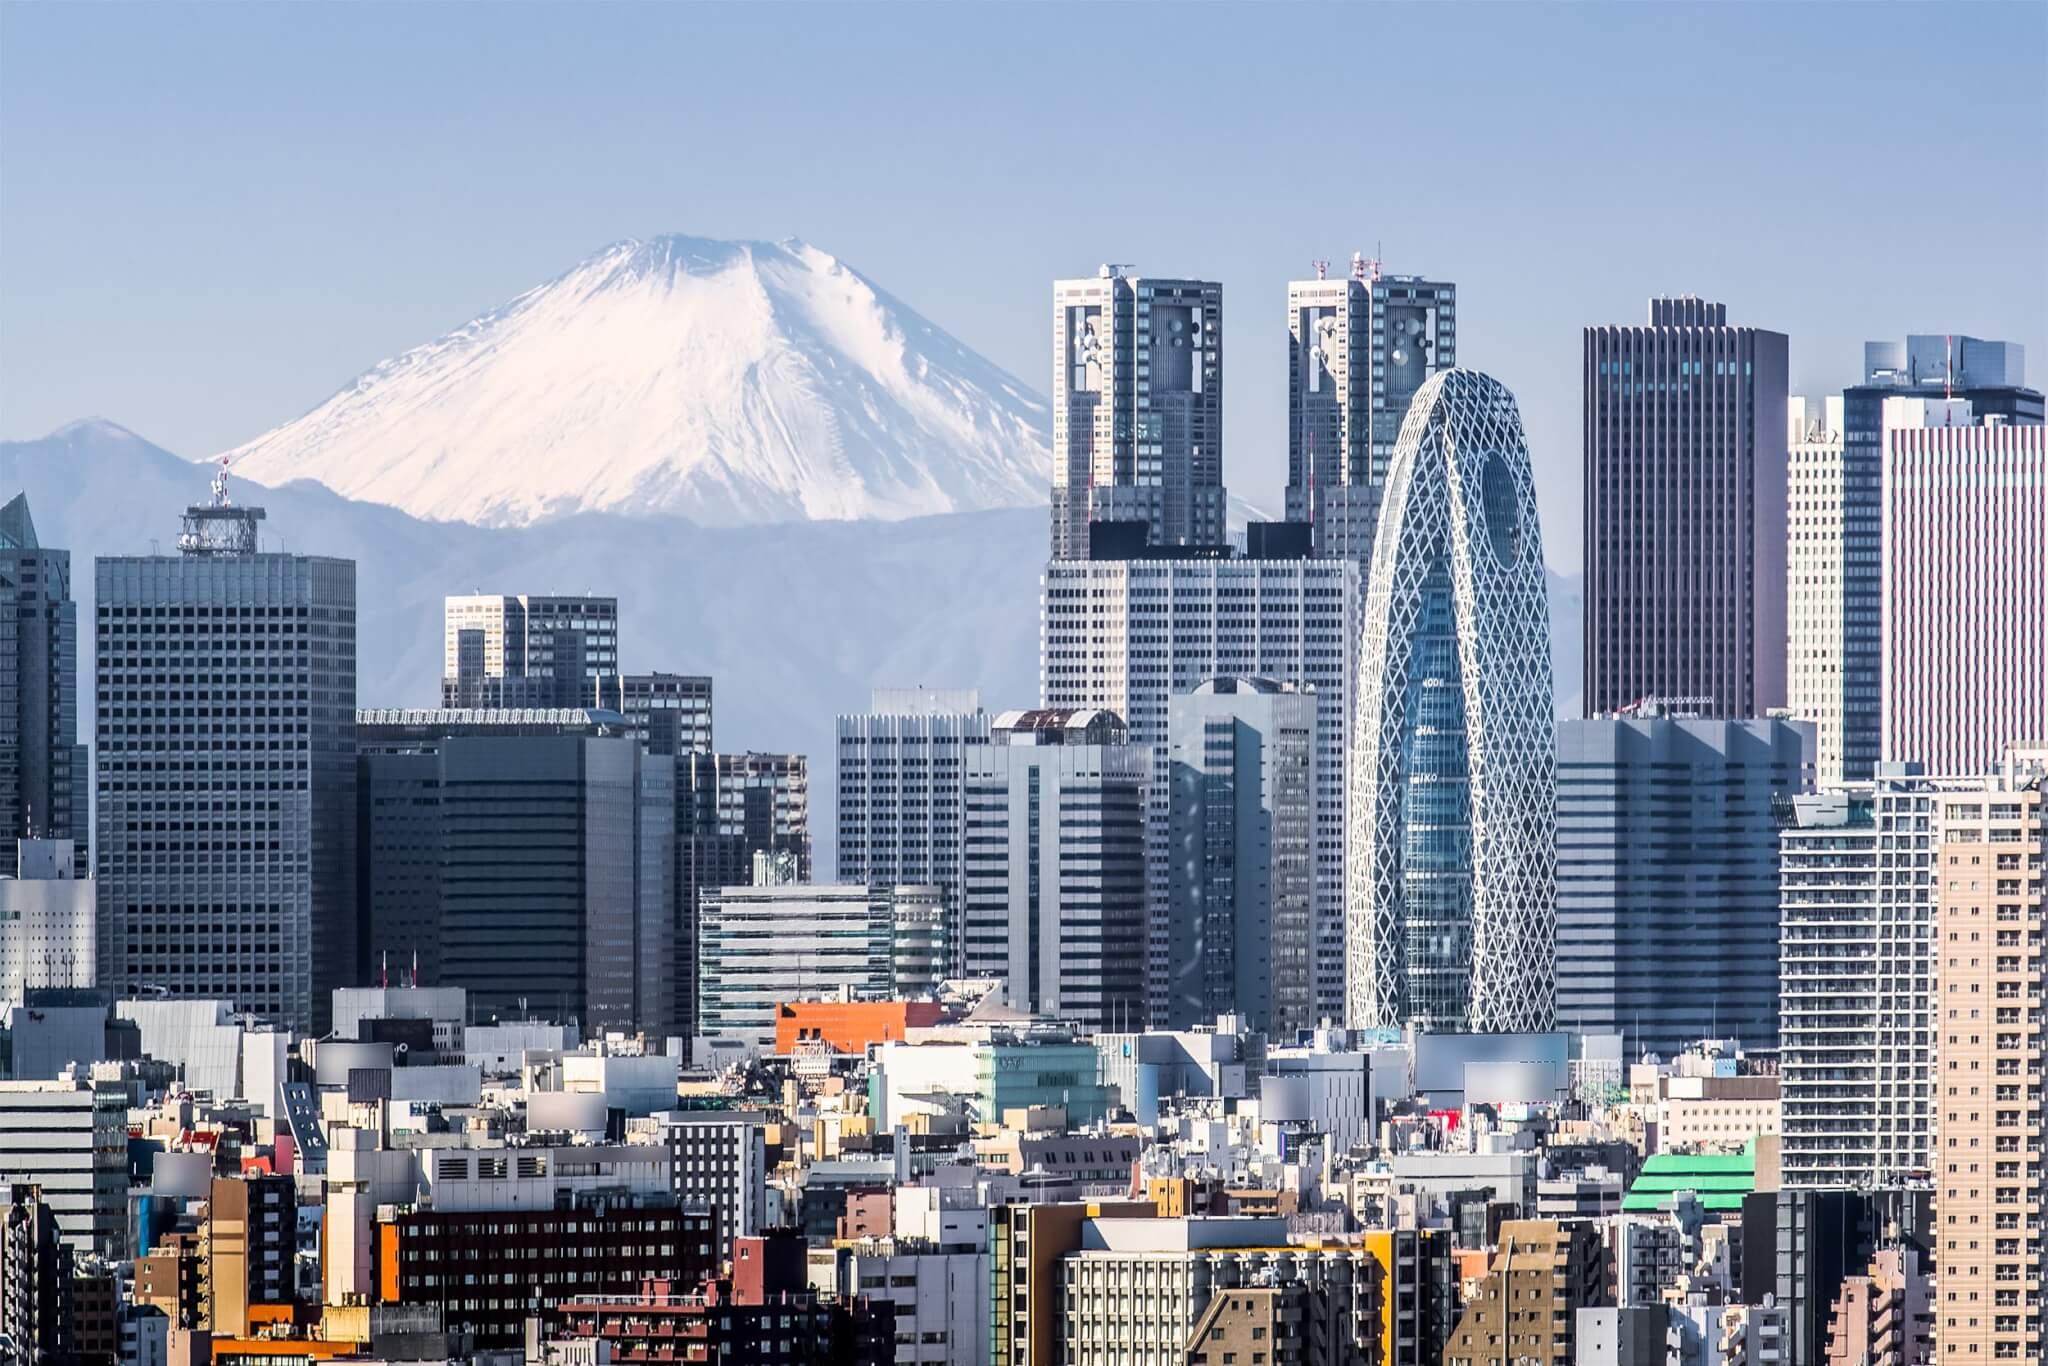 https://travelicious.bold-themes.com/main-demo/wp-content/uploads/sites/2/2018/09/destination-tokyo-02.jpg